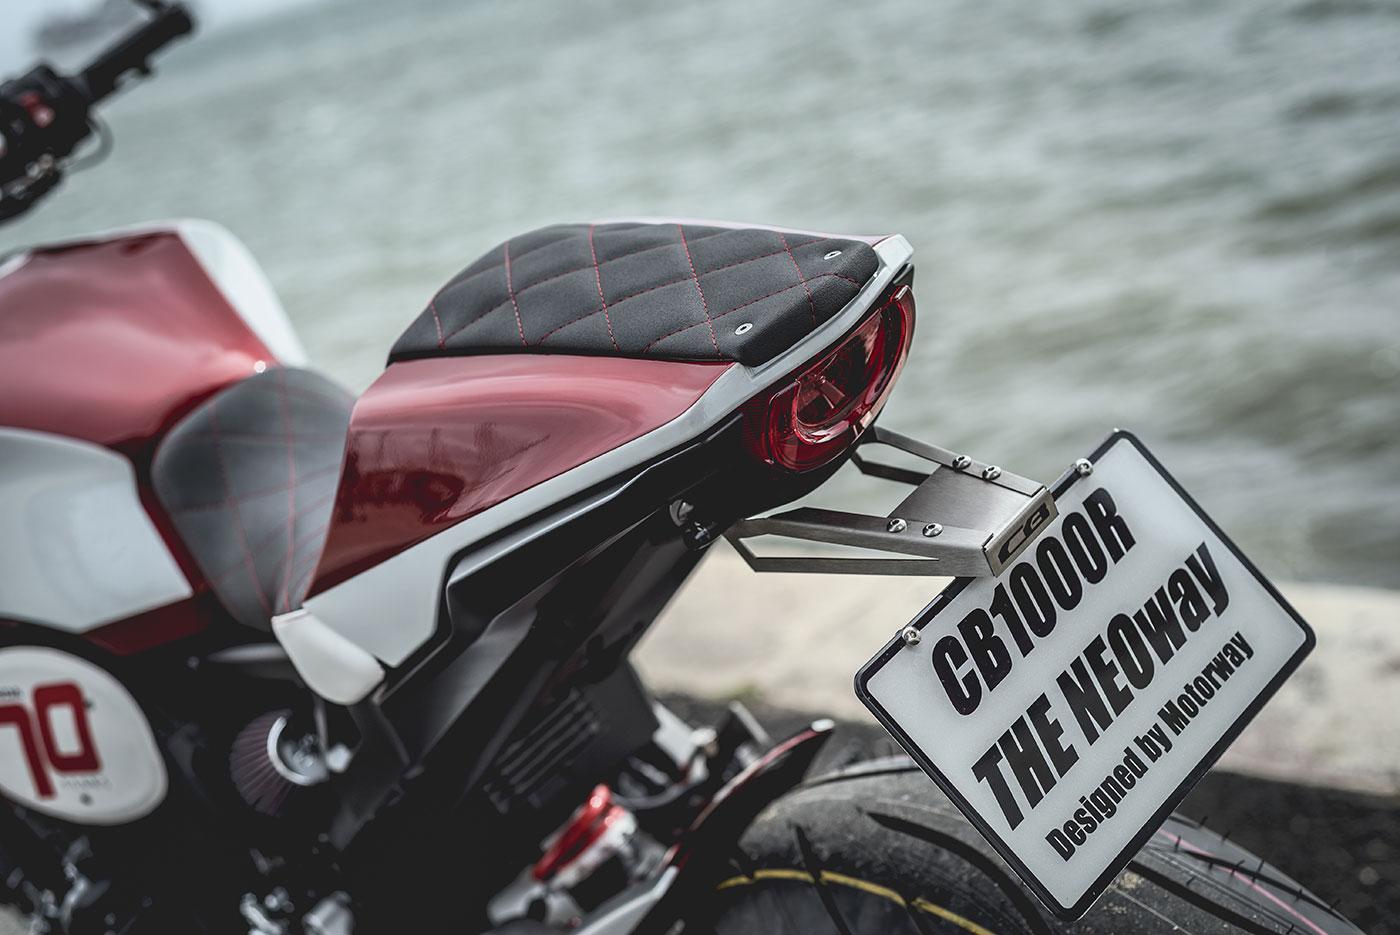 CB1000R70. Honda Motorway